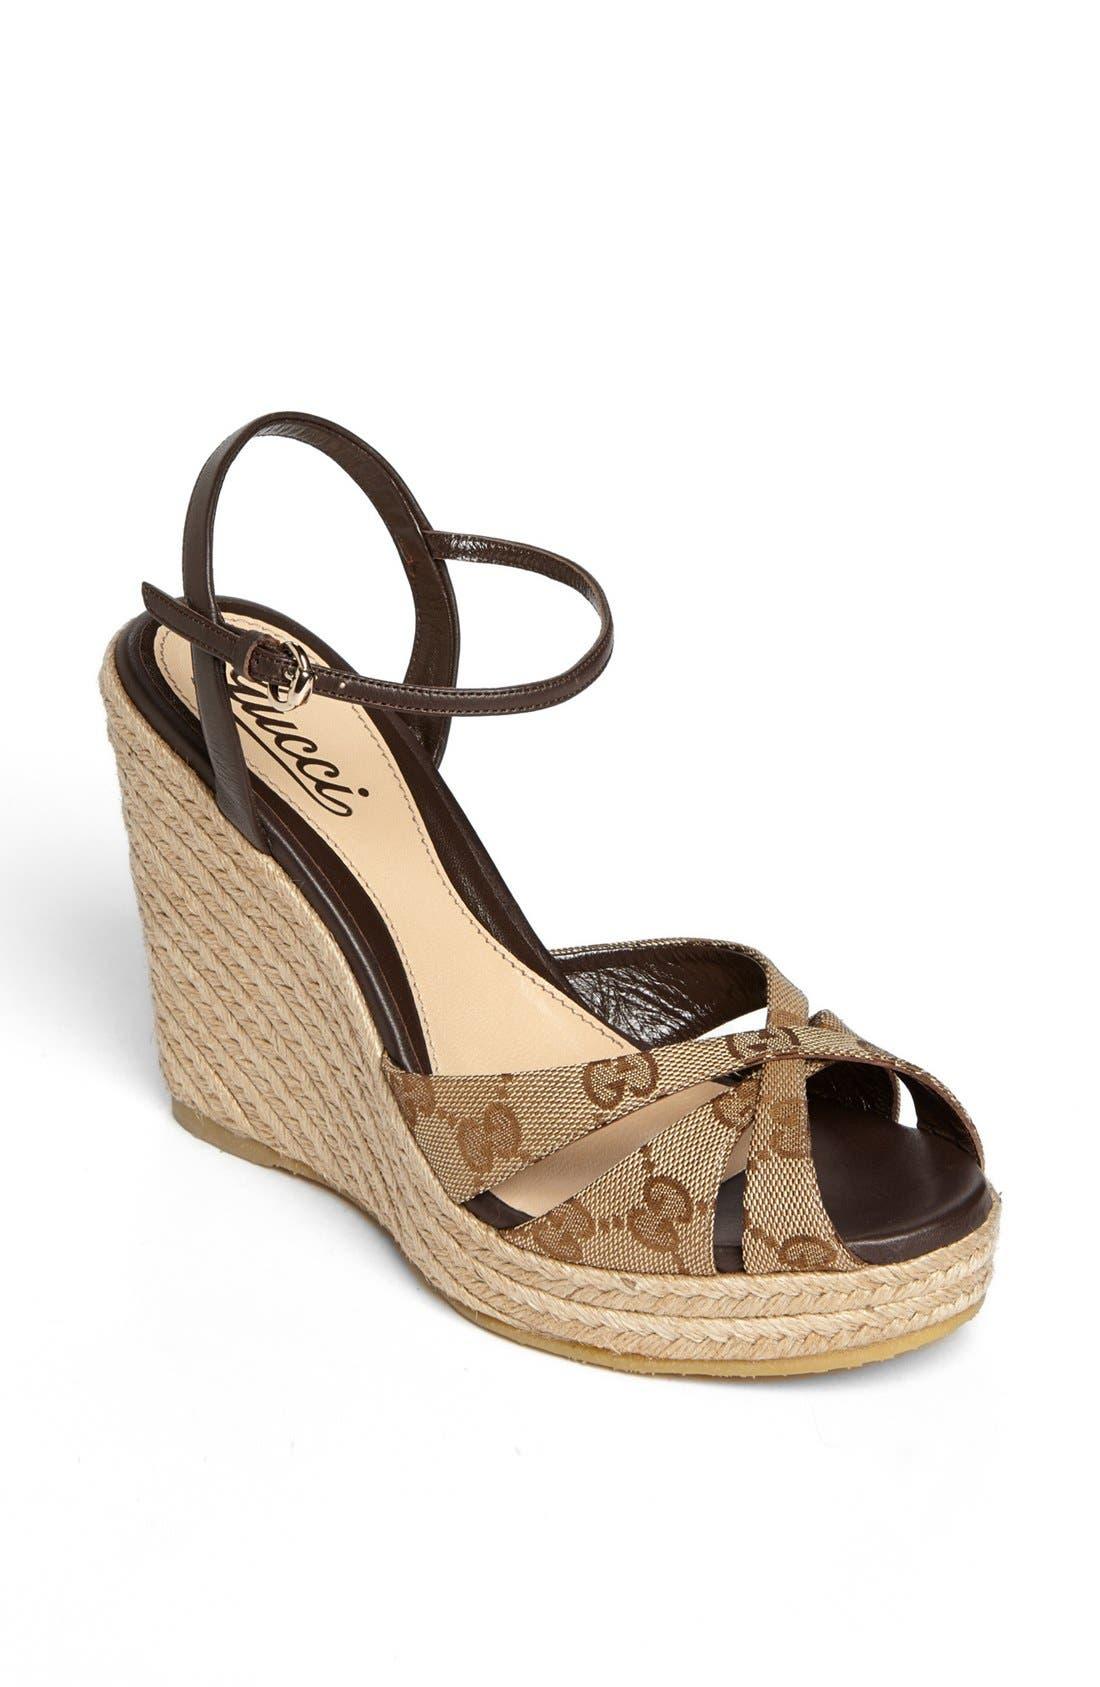 Main Image - Gucci 'Penelope' Espadrille Sandal